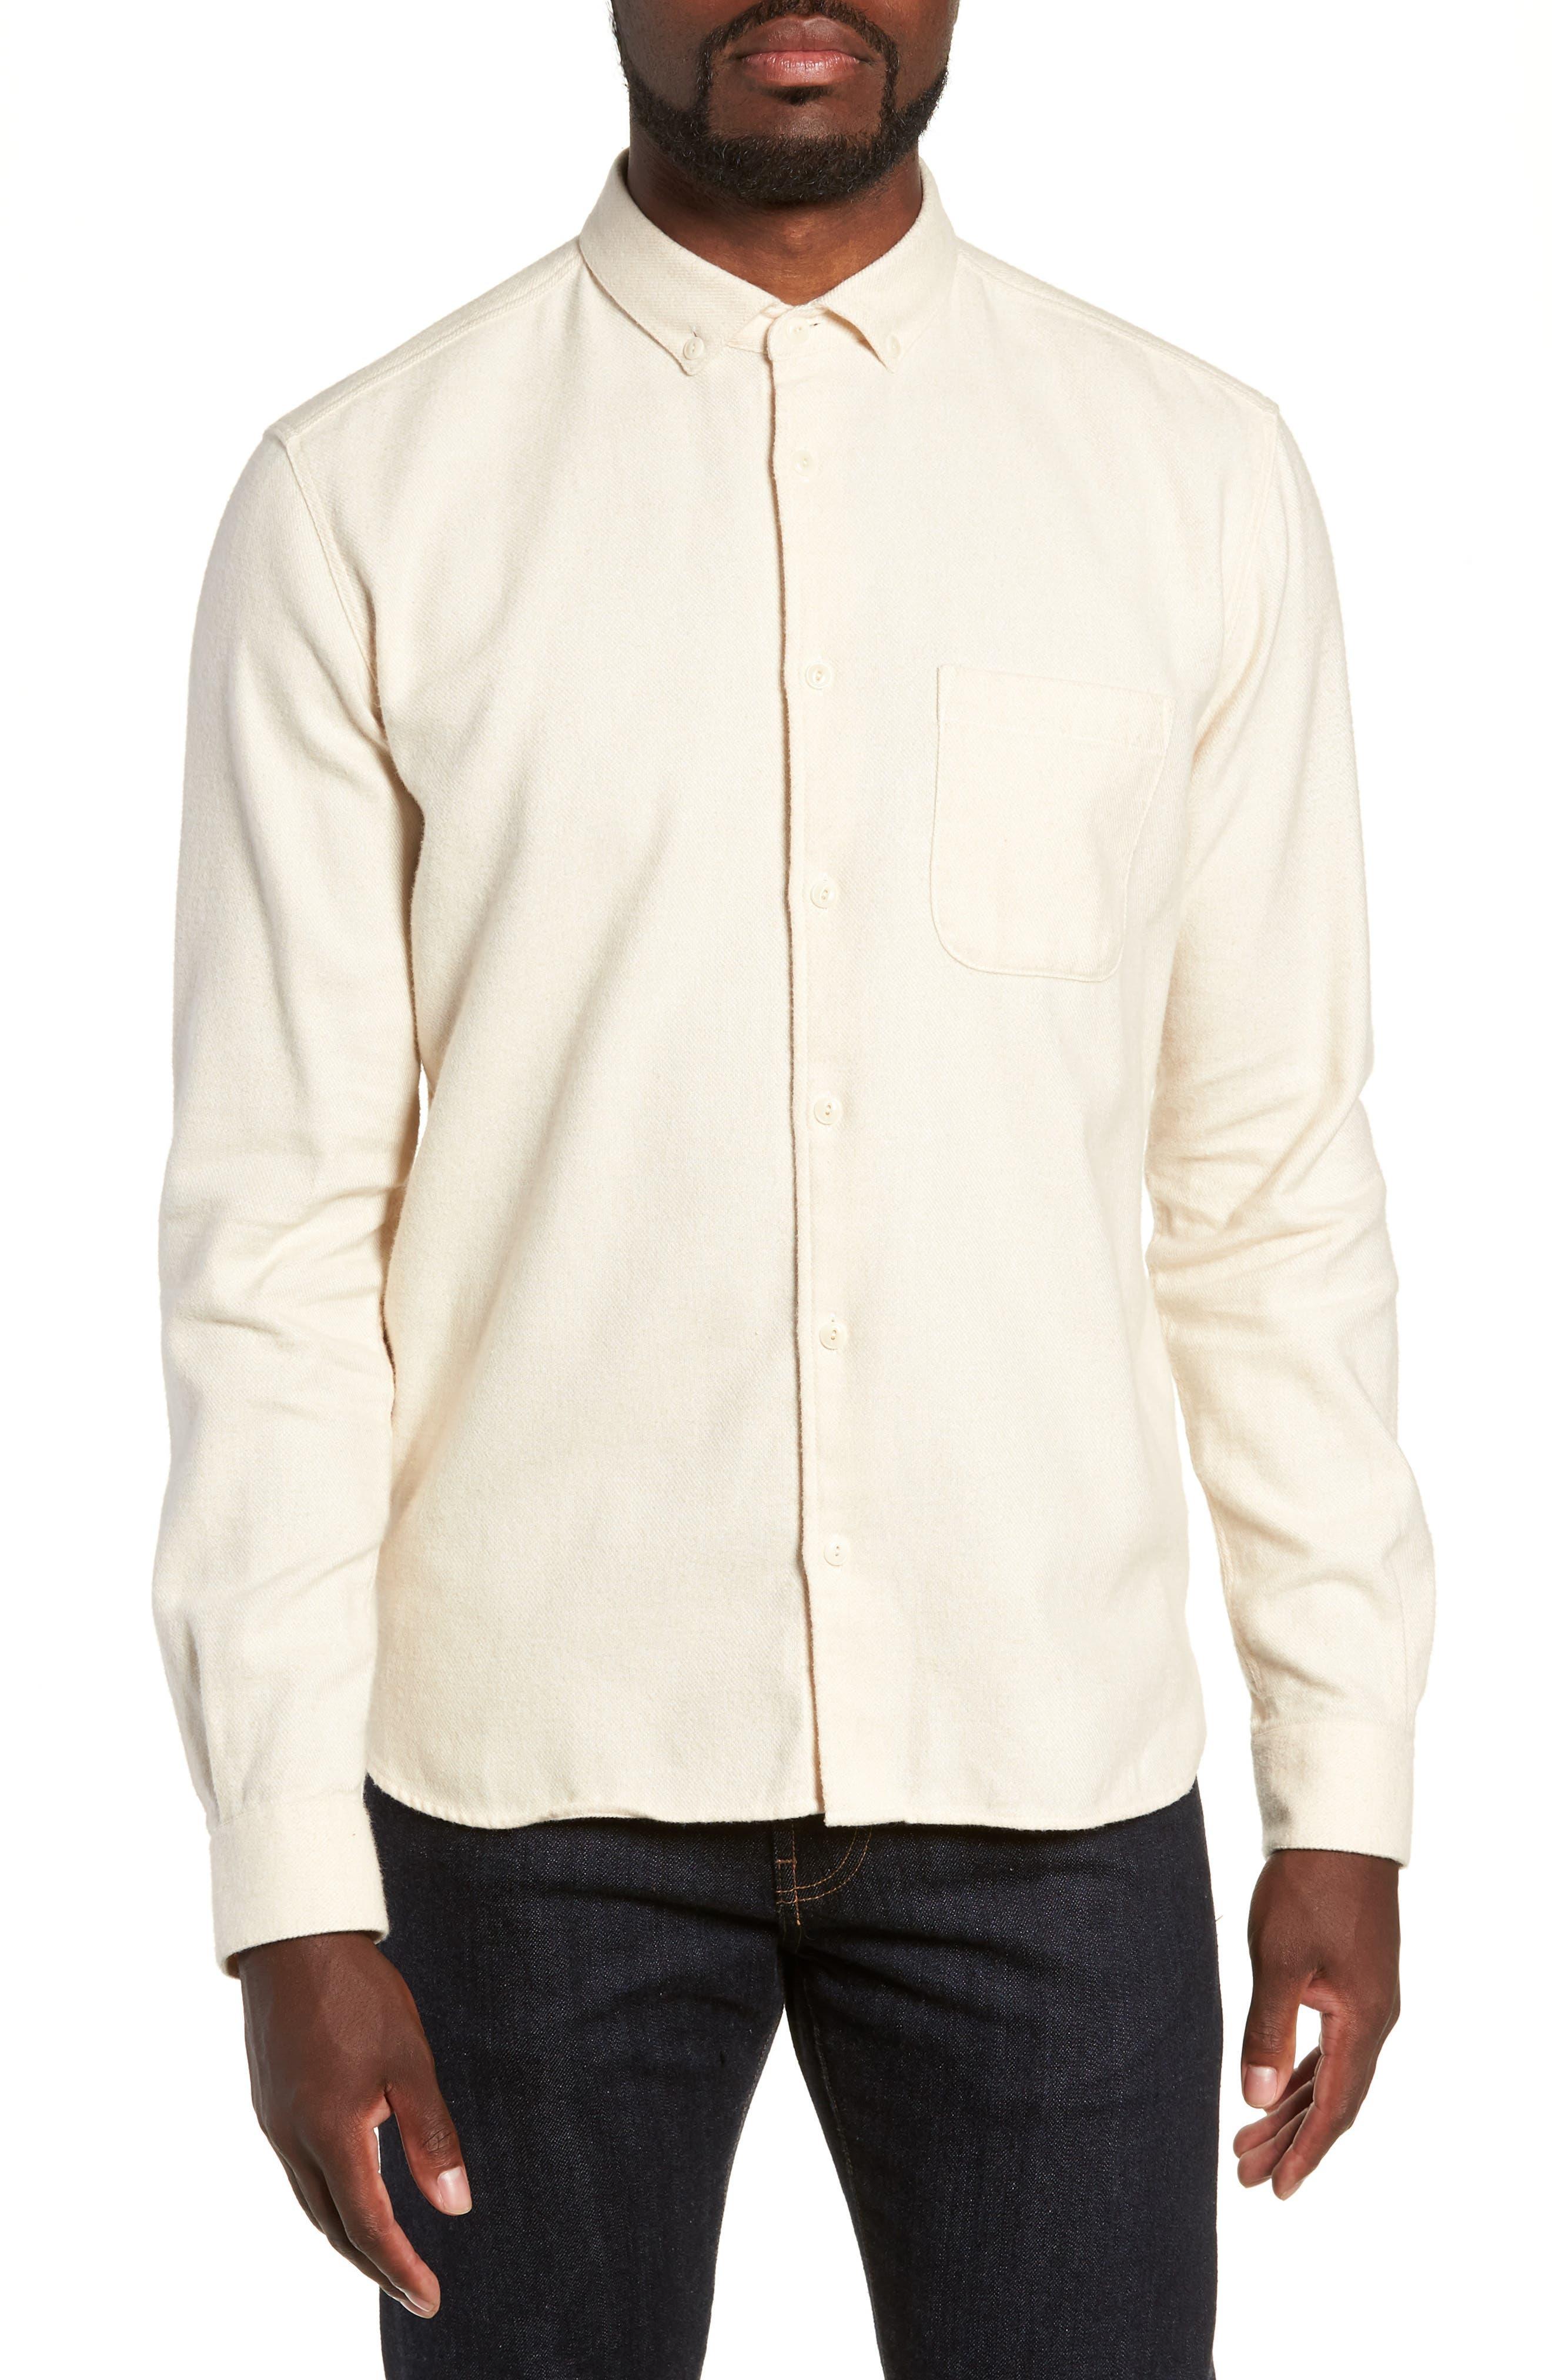 Marl Flannel Shirt,                             Main thumbnail 1, color,                             ECRU